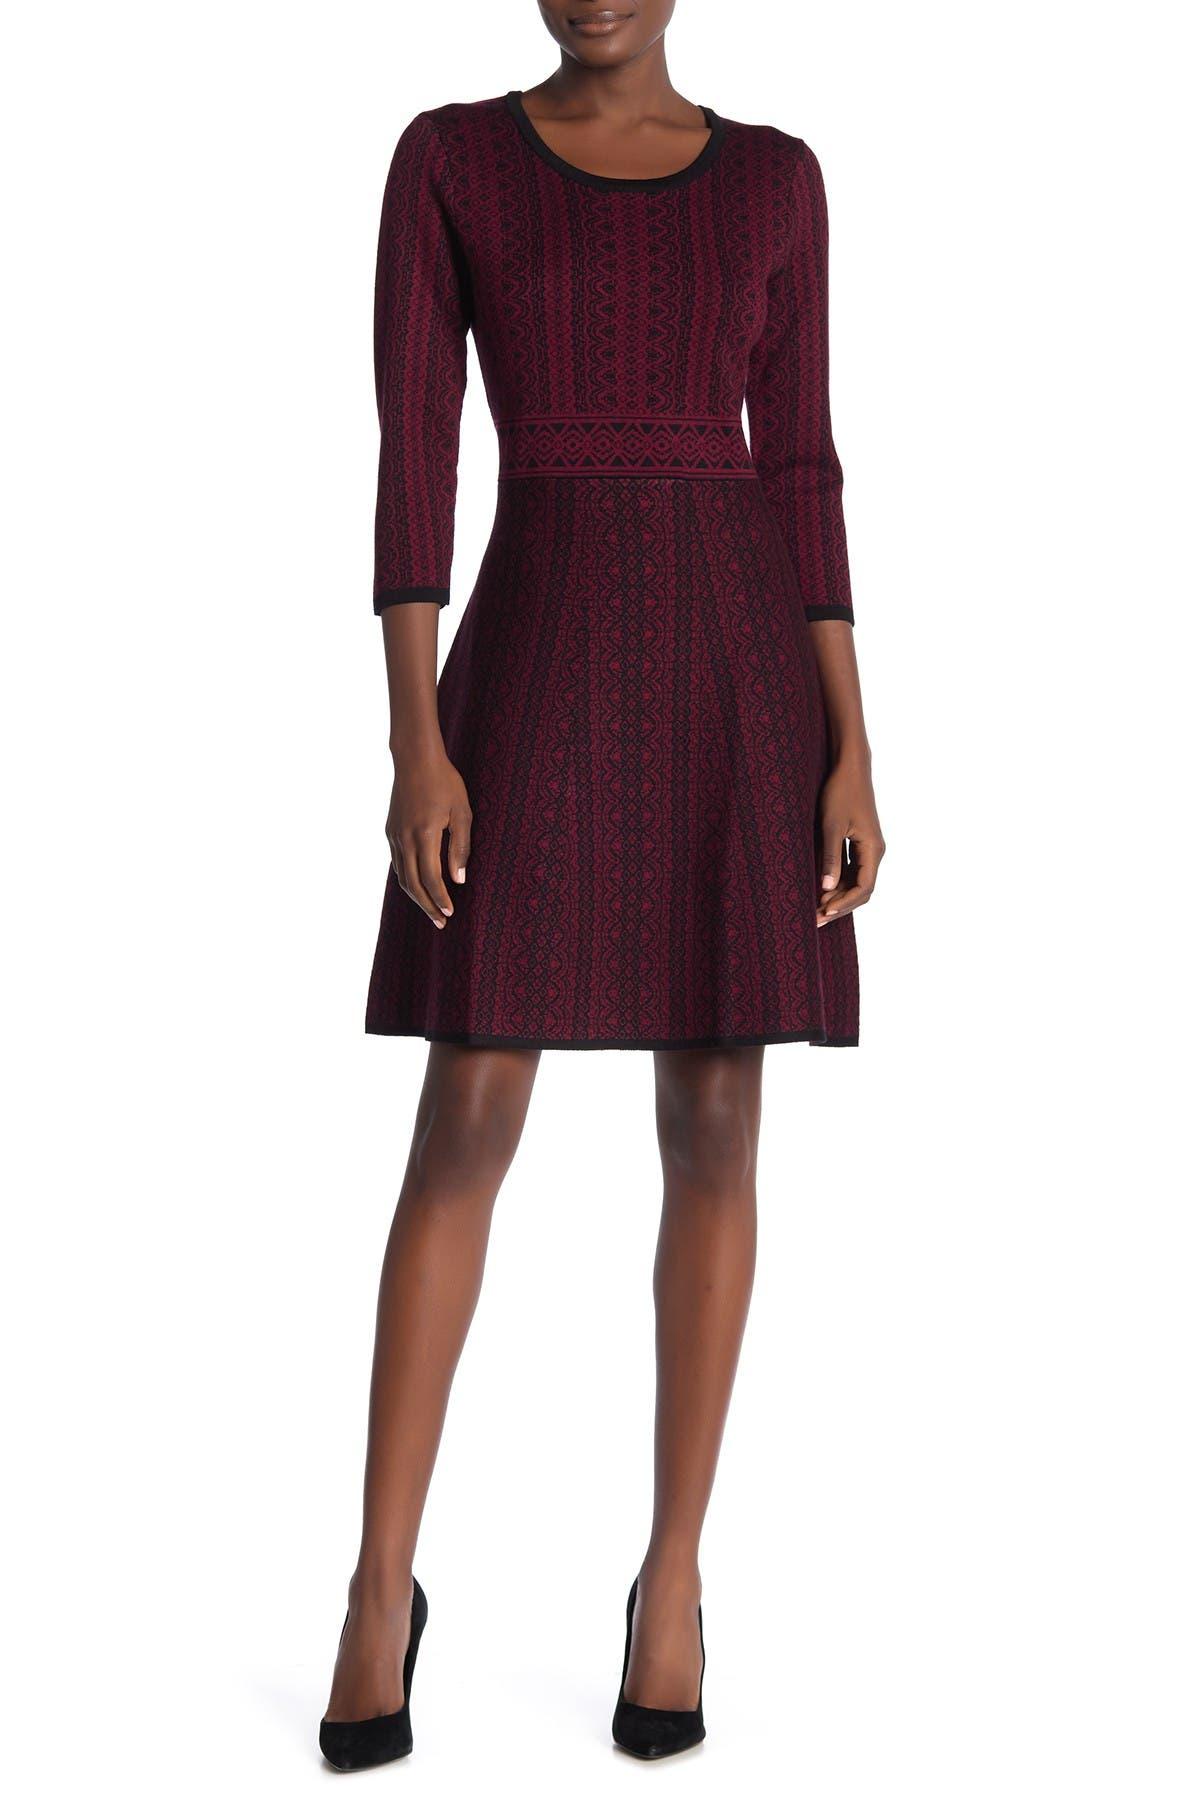 Image of Nina Leonard Geometric Print Sweater Dress